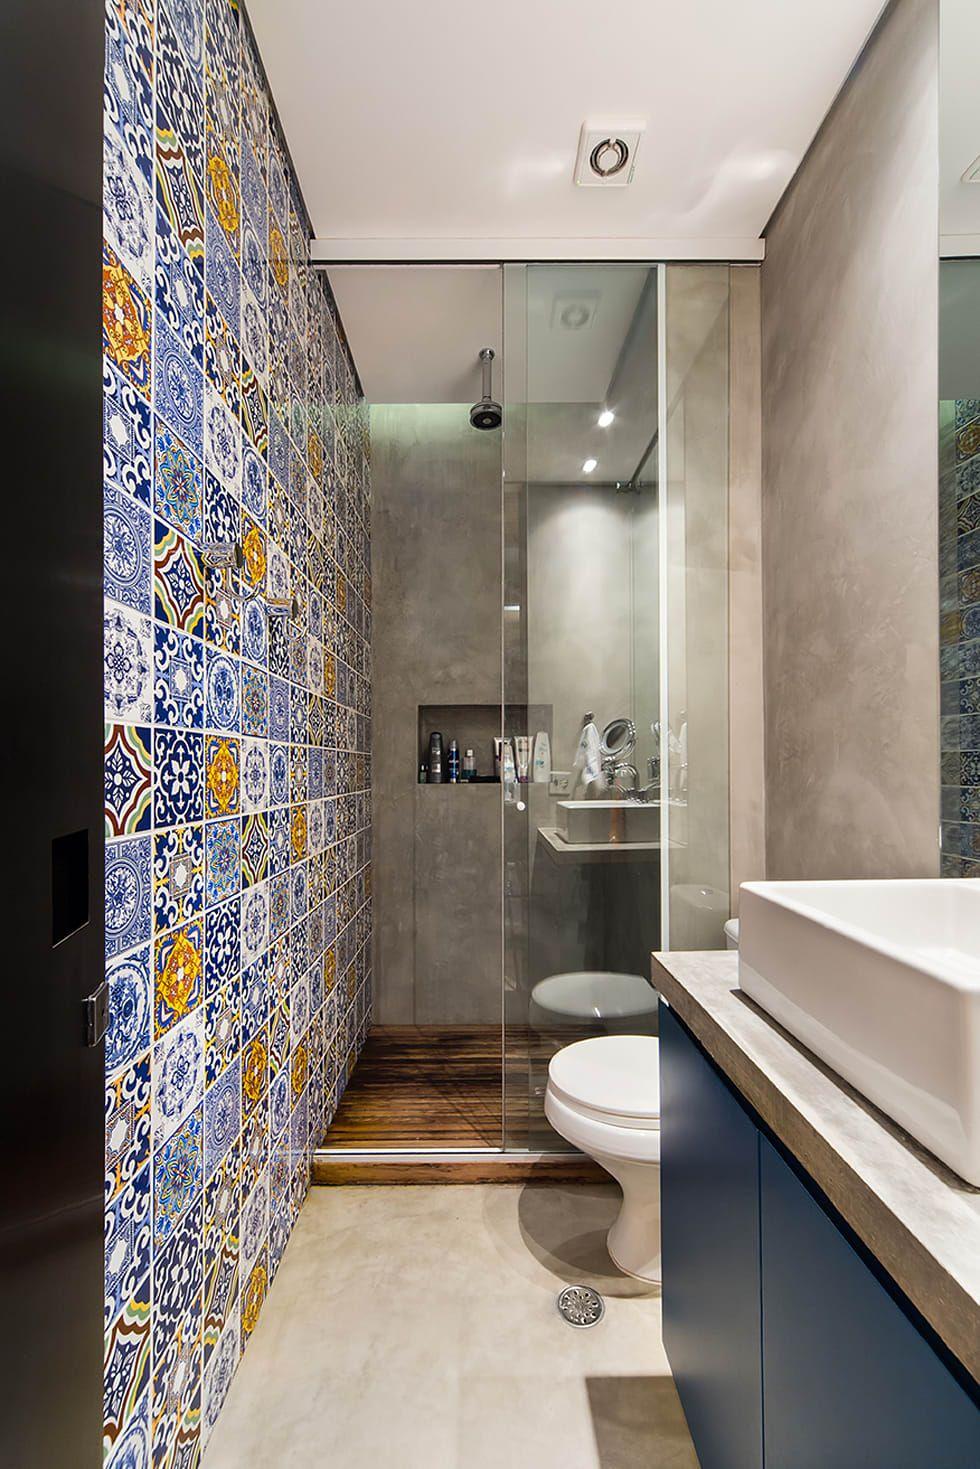 Banheiro estreito e comprido